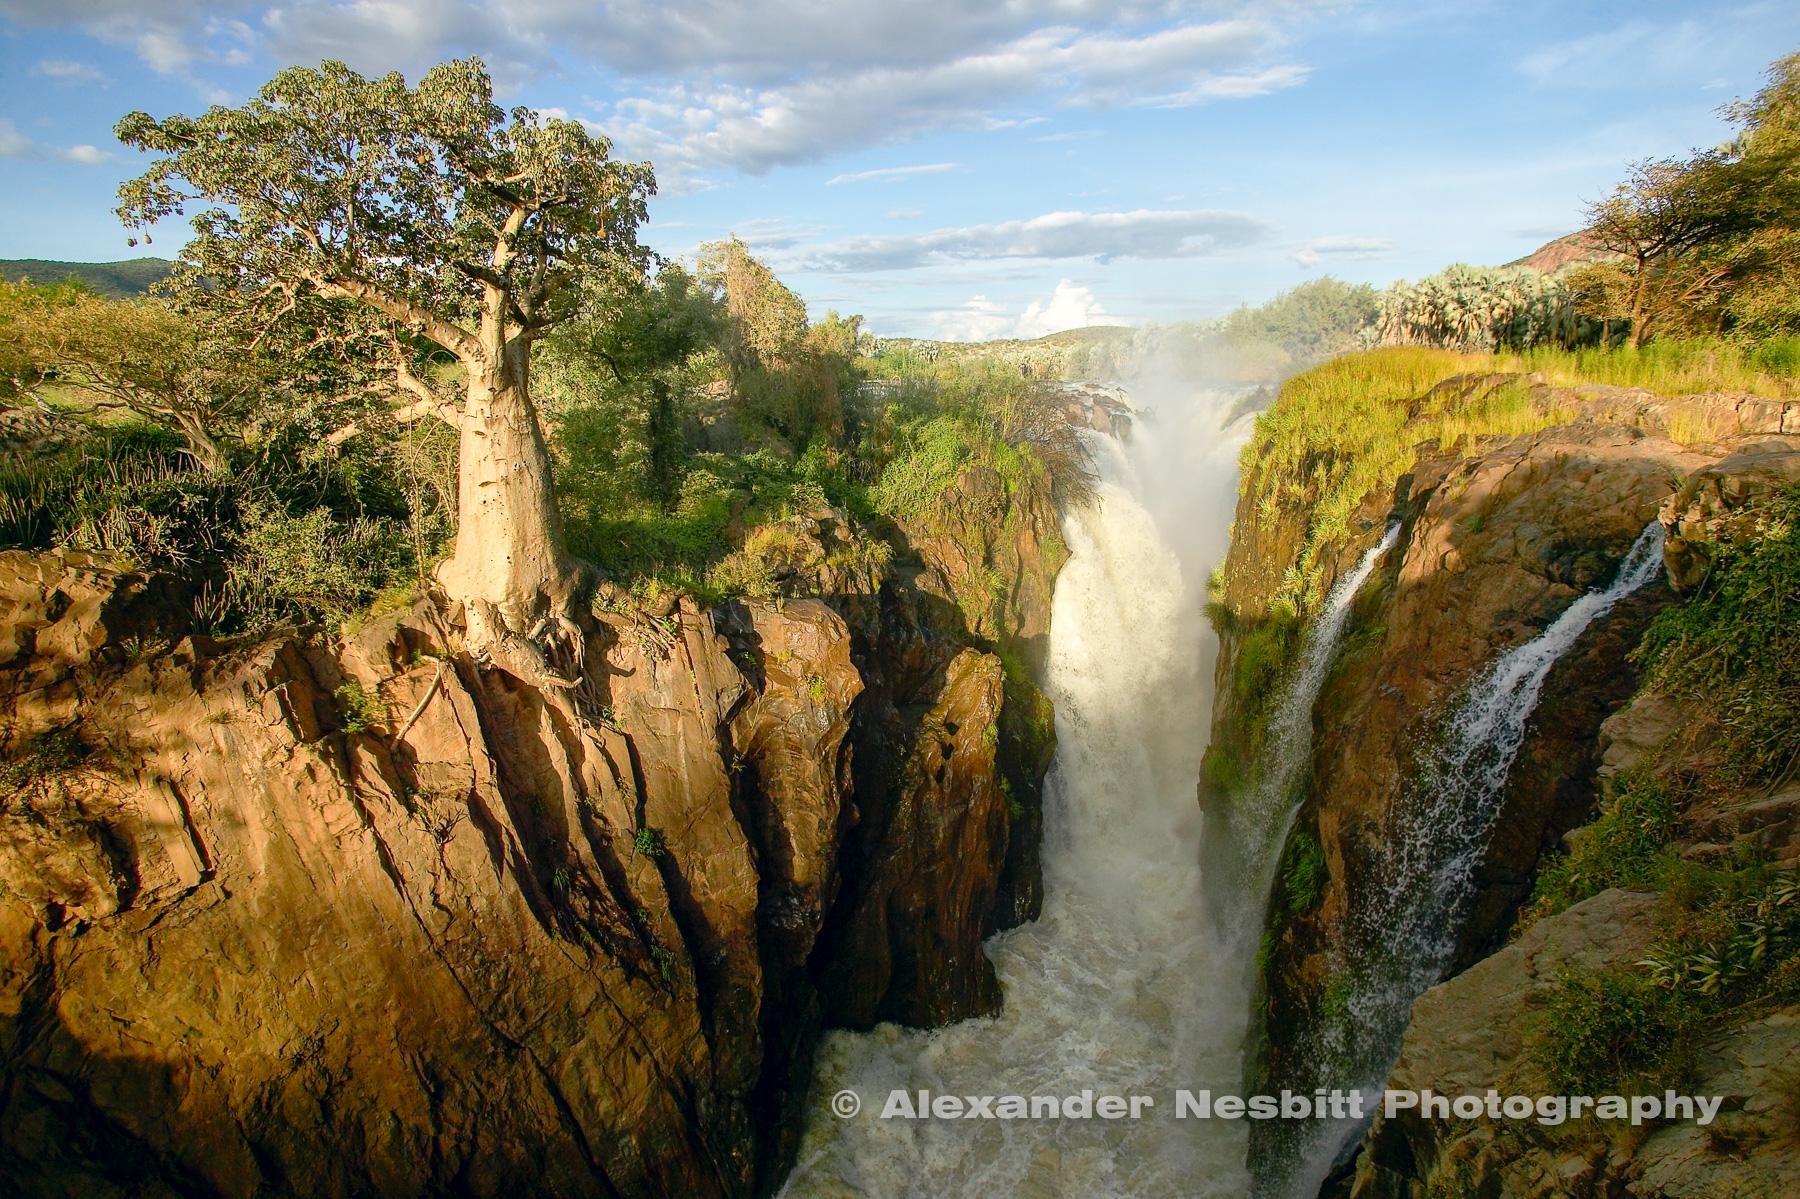 Nesbitt-portfolio-high-res-Nesbitt-Namibia-059U5400